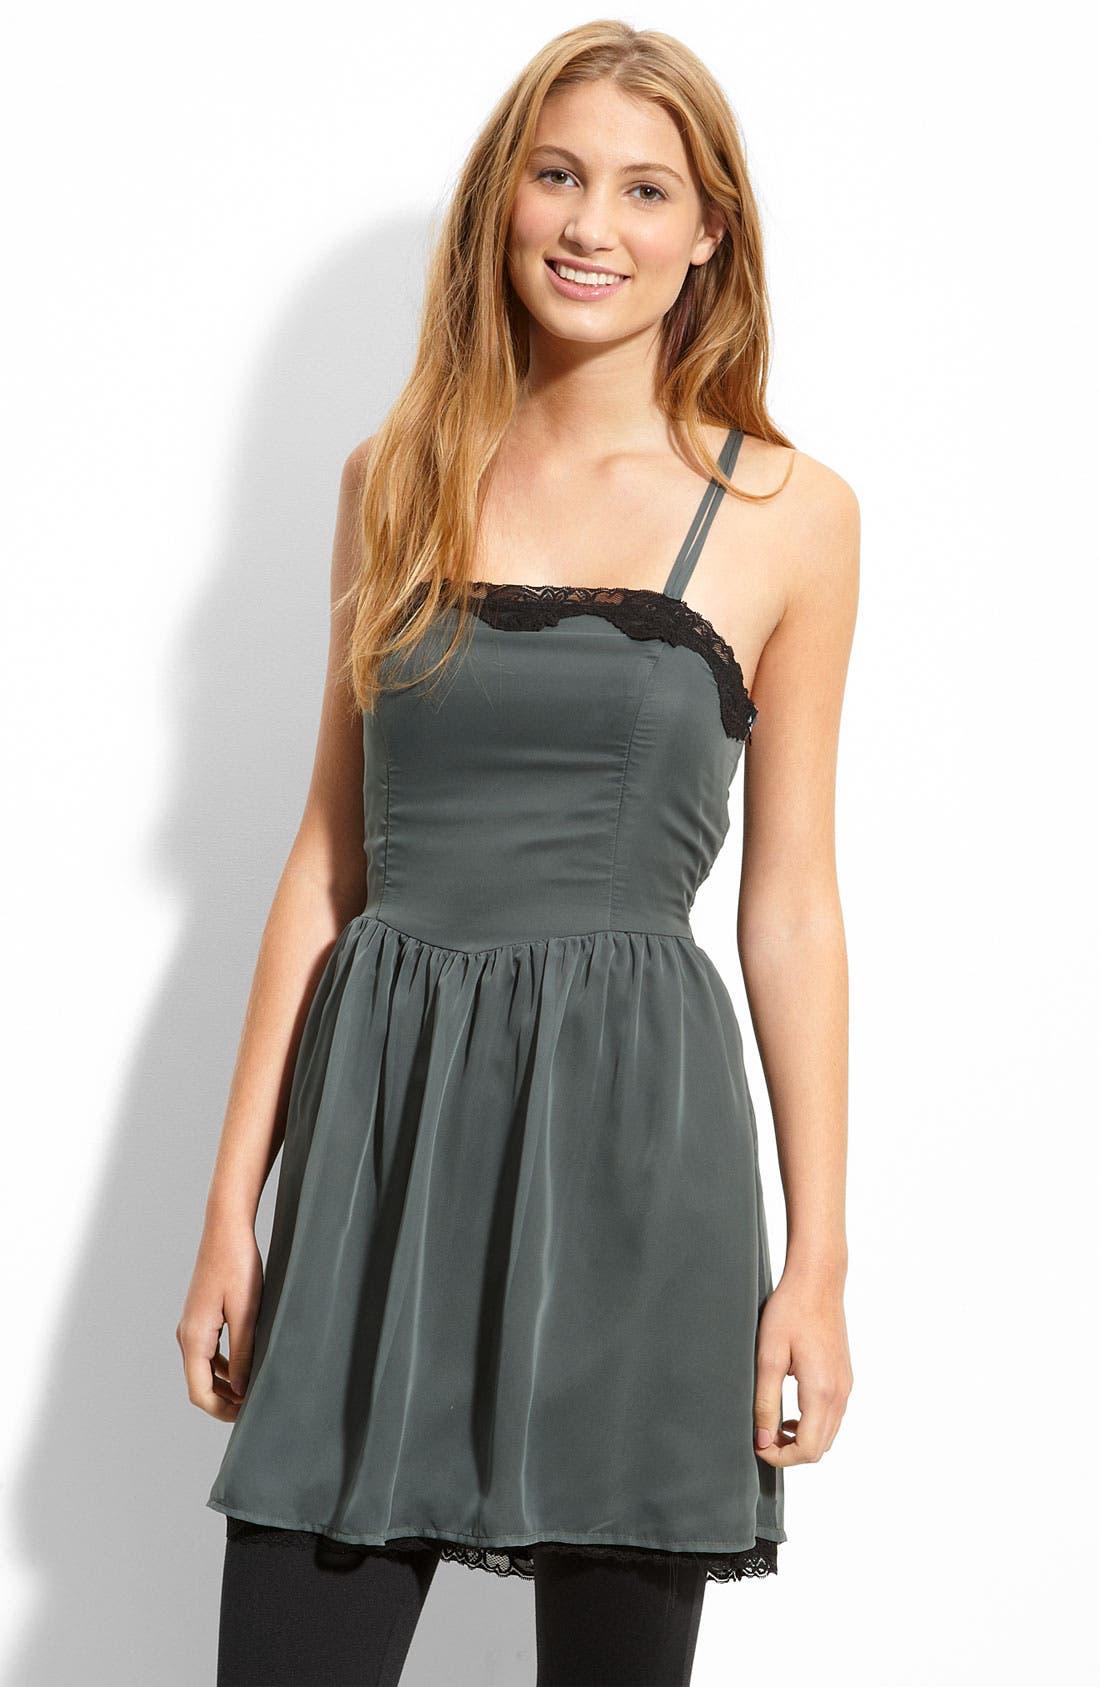 Alternate Image 1 Selected - Mimi Chica Lace Trim Dress (Juniors)